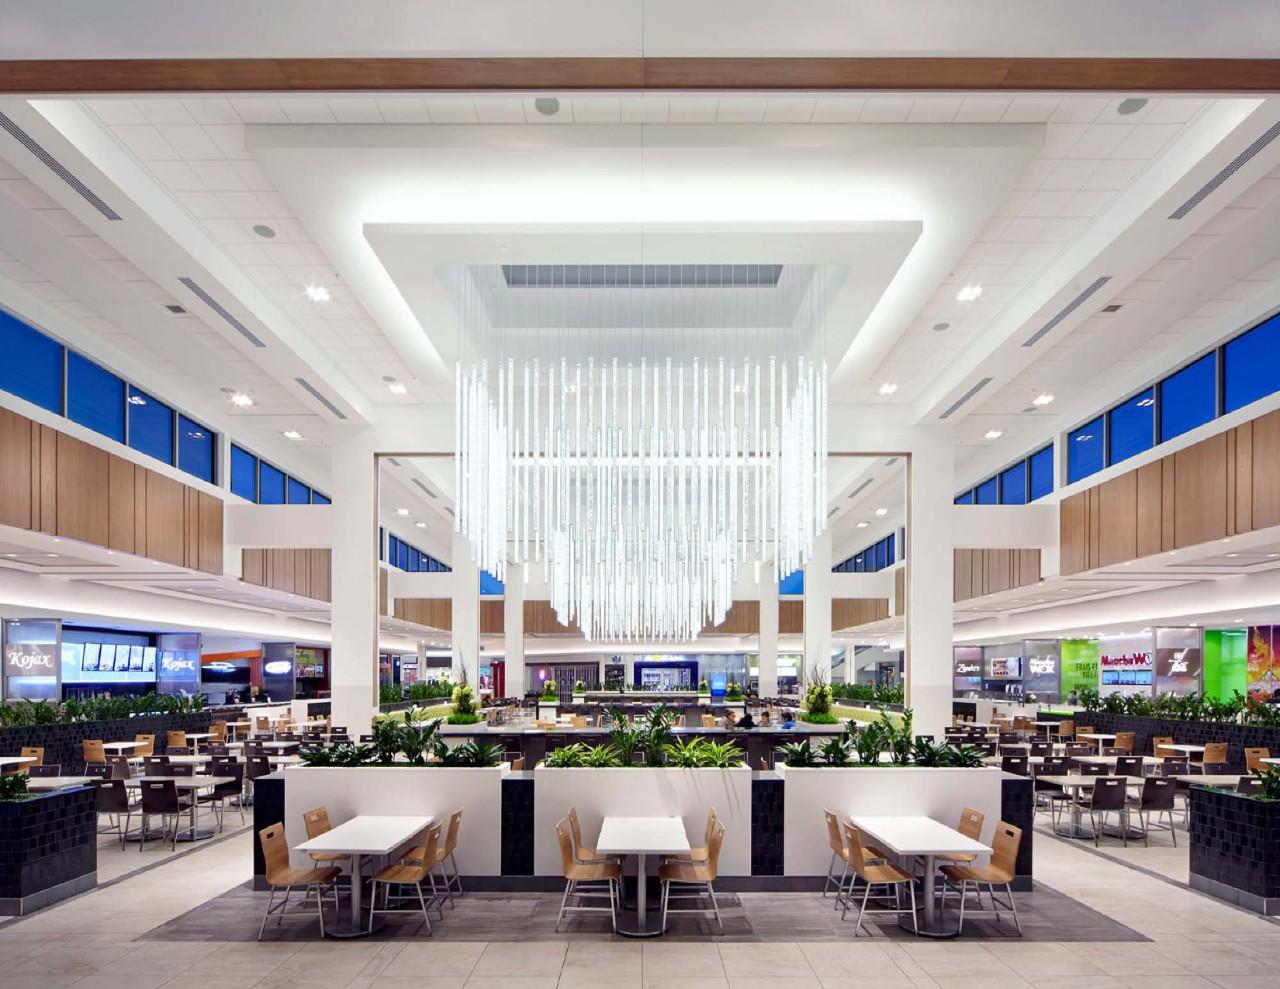 (CF Galeries d'Anjou food court. Photo: Cadillac Fairview)